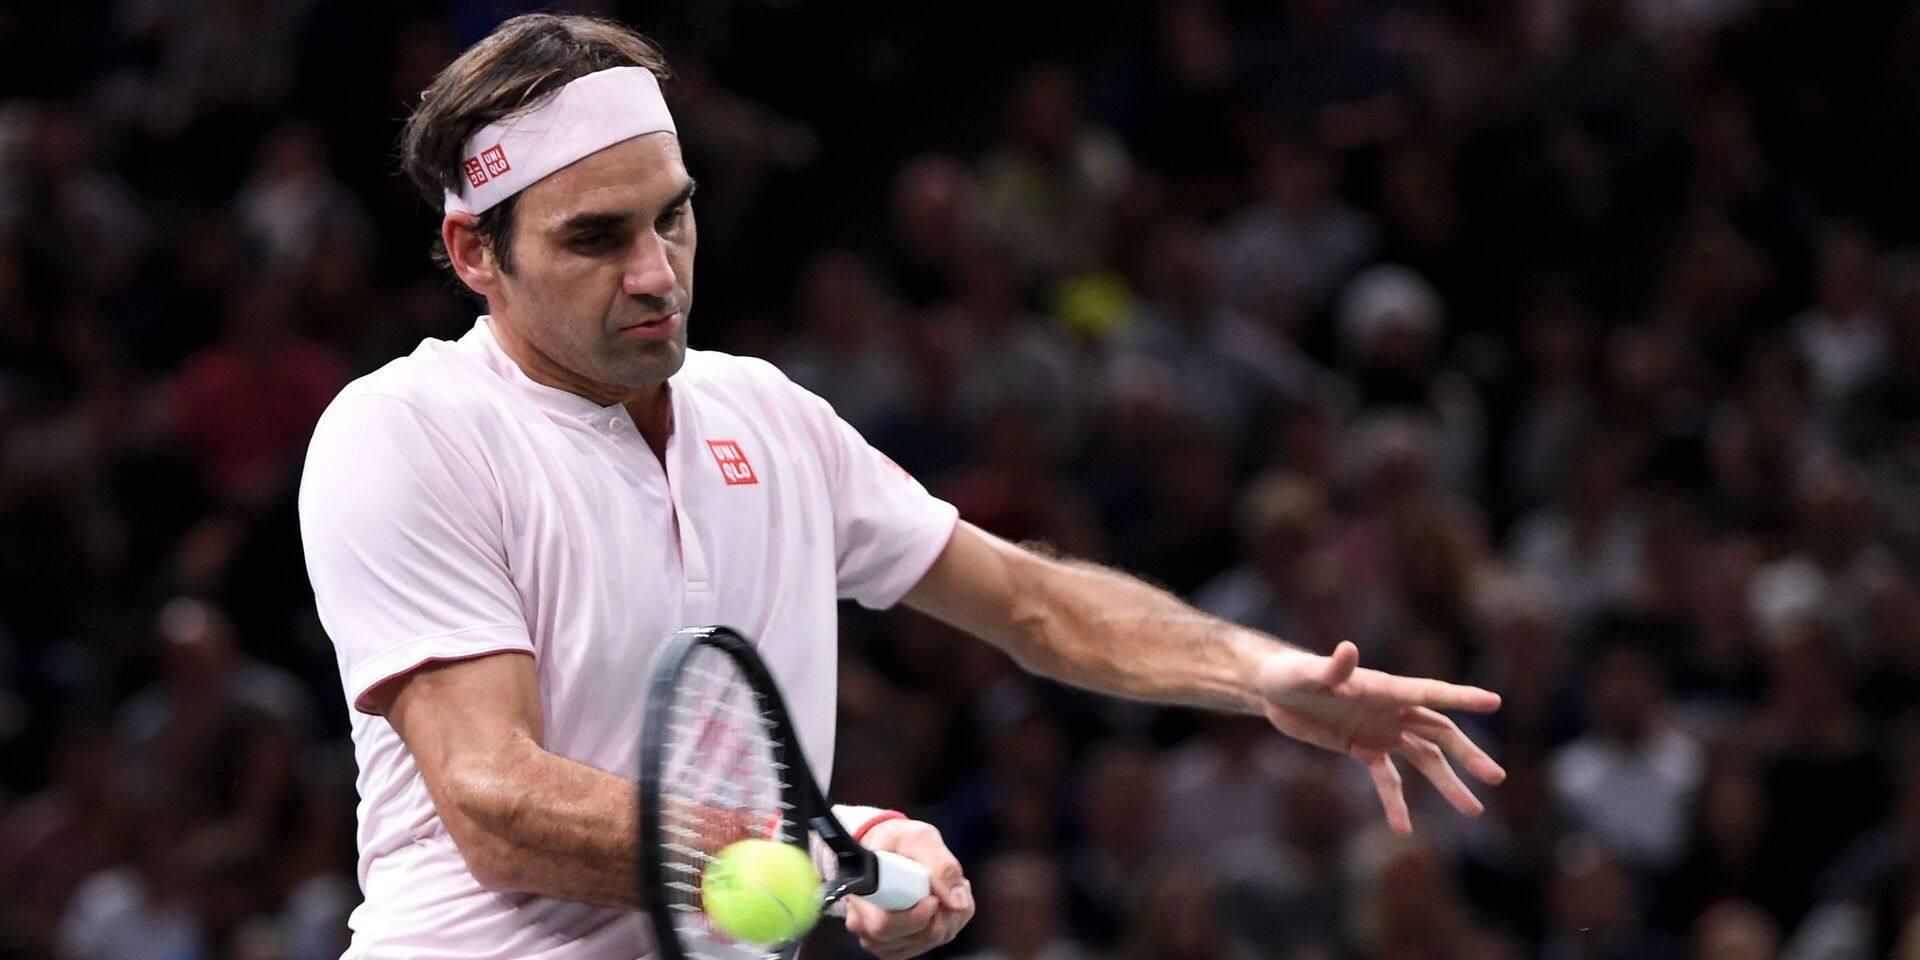 ATP Paris: Federer rejoint Djokovic en demi-finale